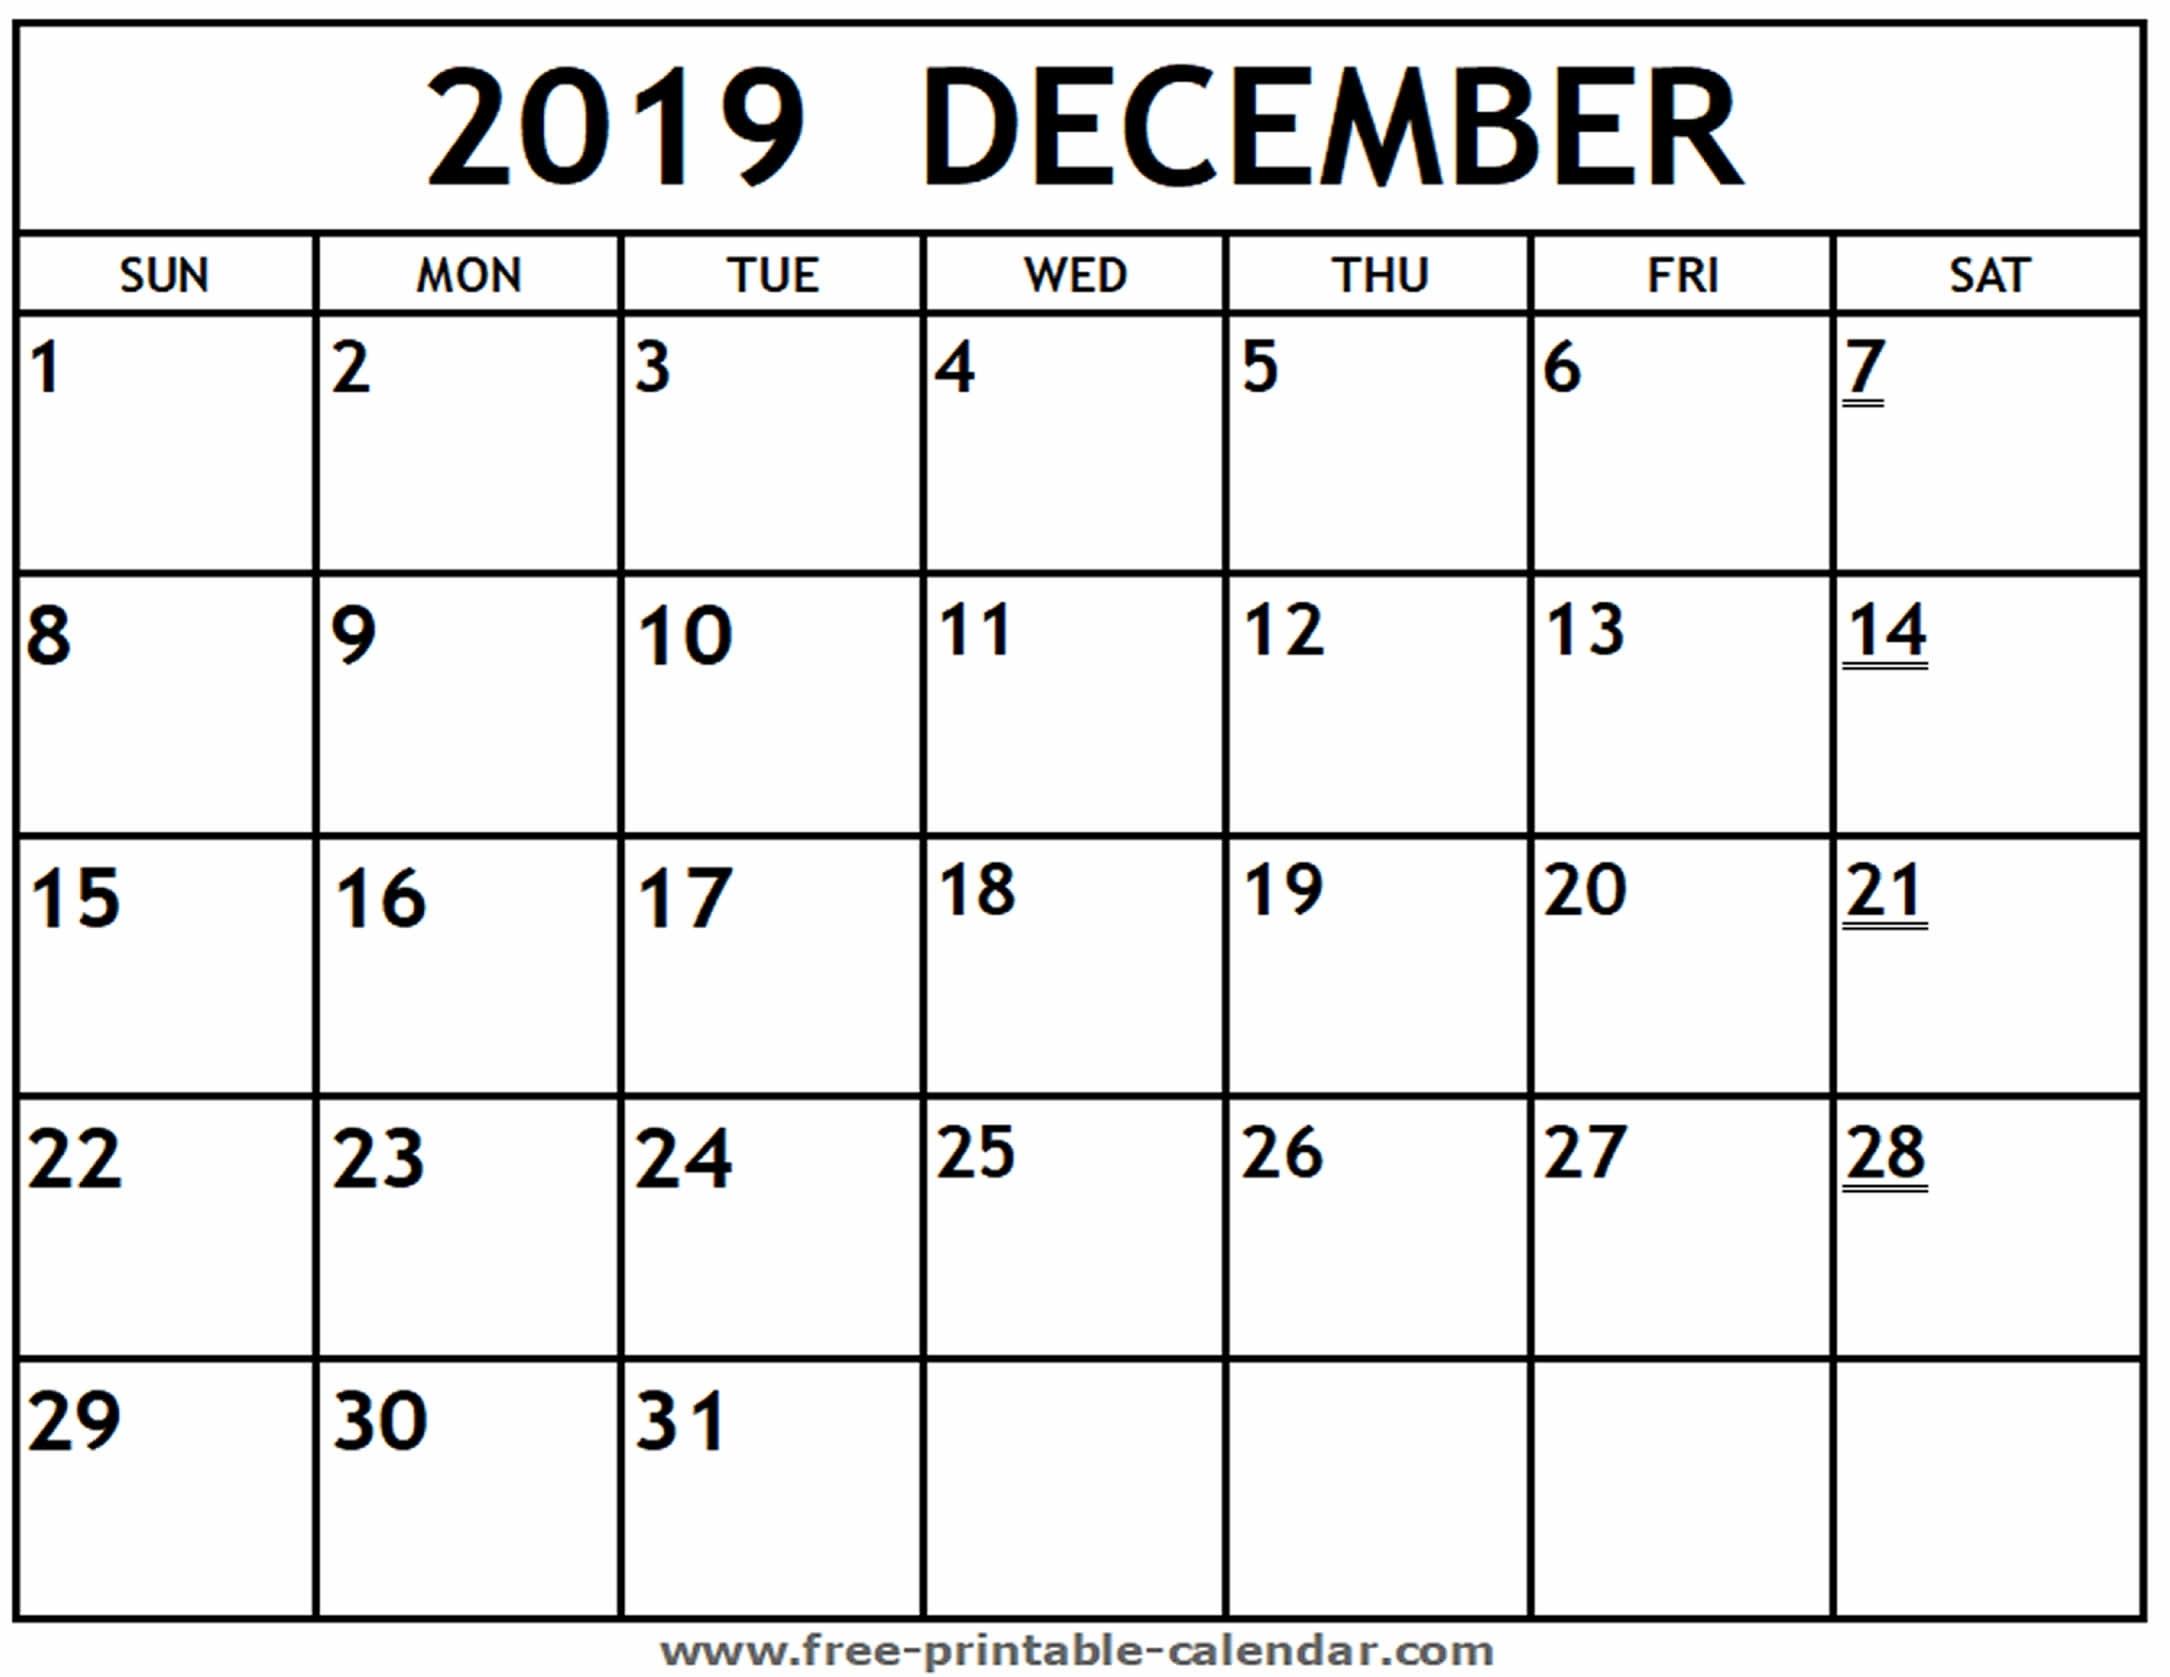 Printable 2019 December Calendar - Free-Printable-Calendar